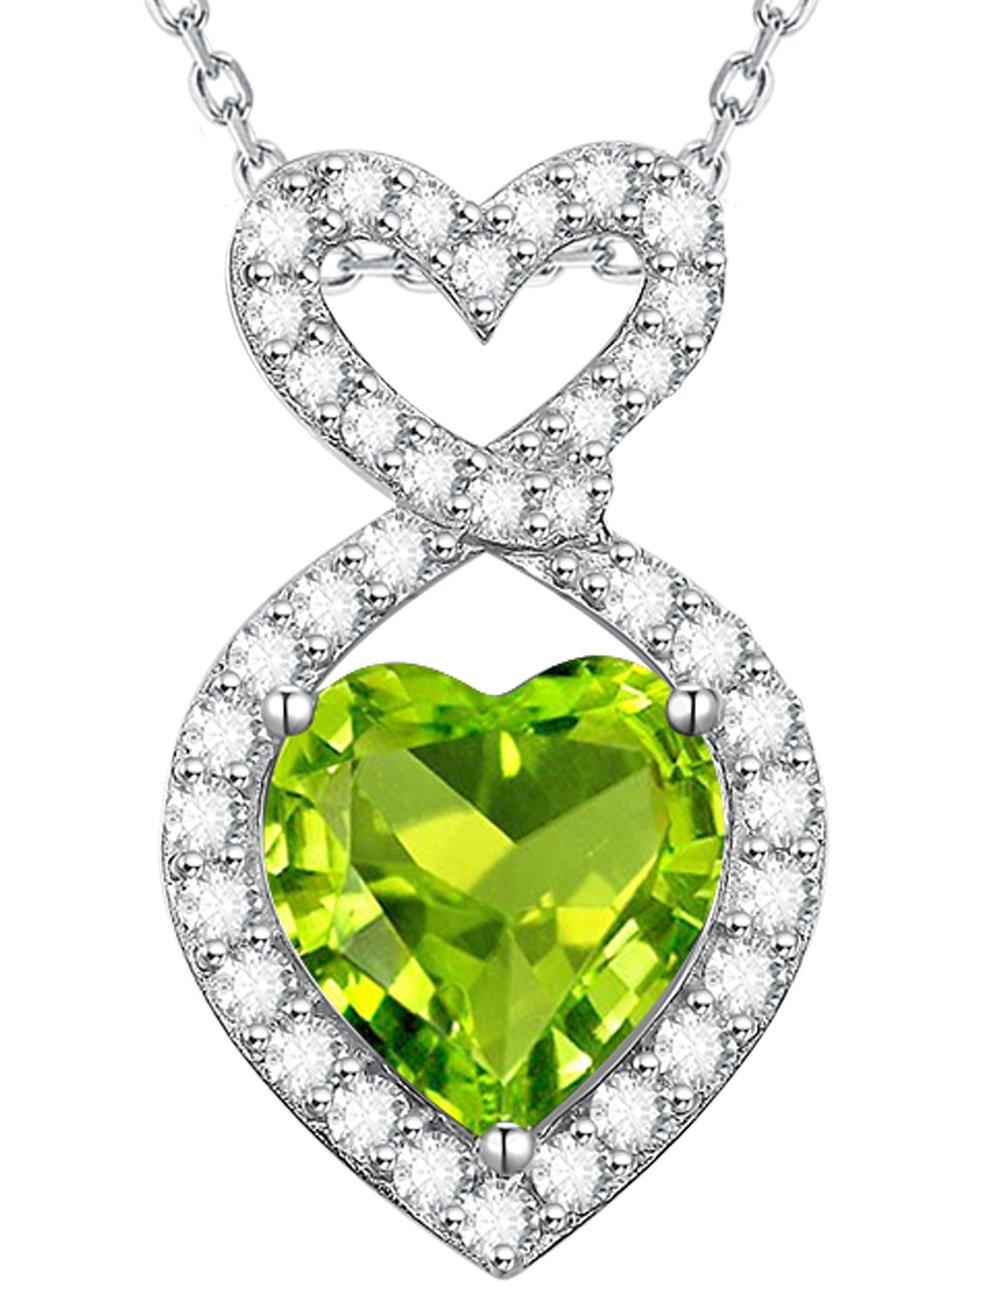 Green Peridot August Birthstone Necklace Love Heart Infinity Jewelry Birthday Anniversary Gift for Women Sterling Silver Swarovski Pendant -20''Chain